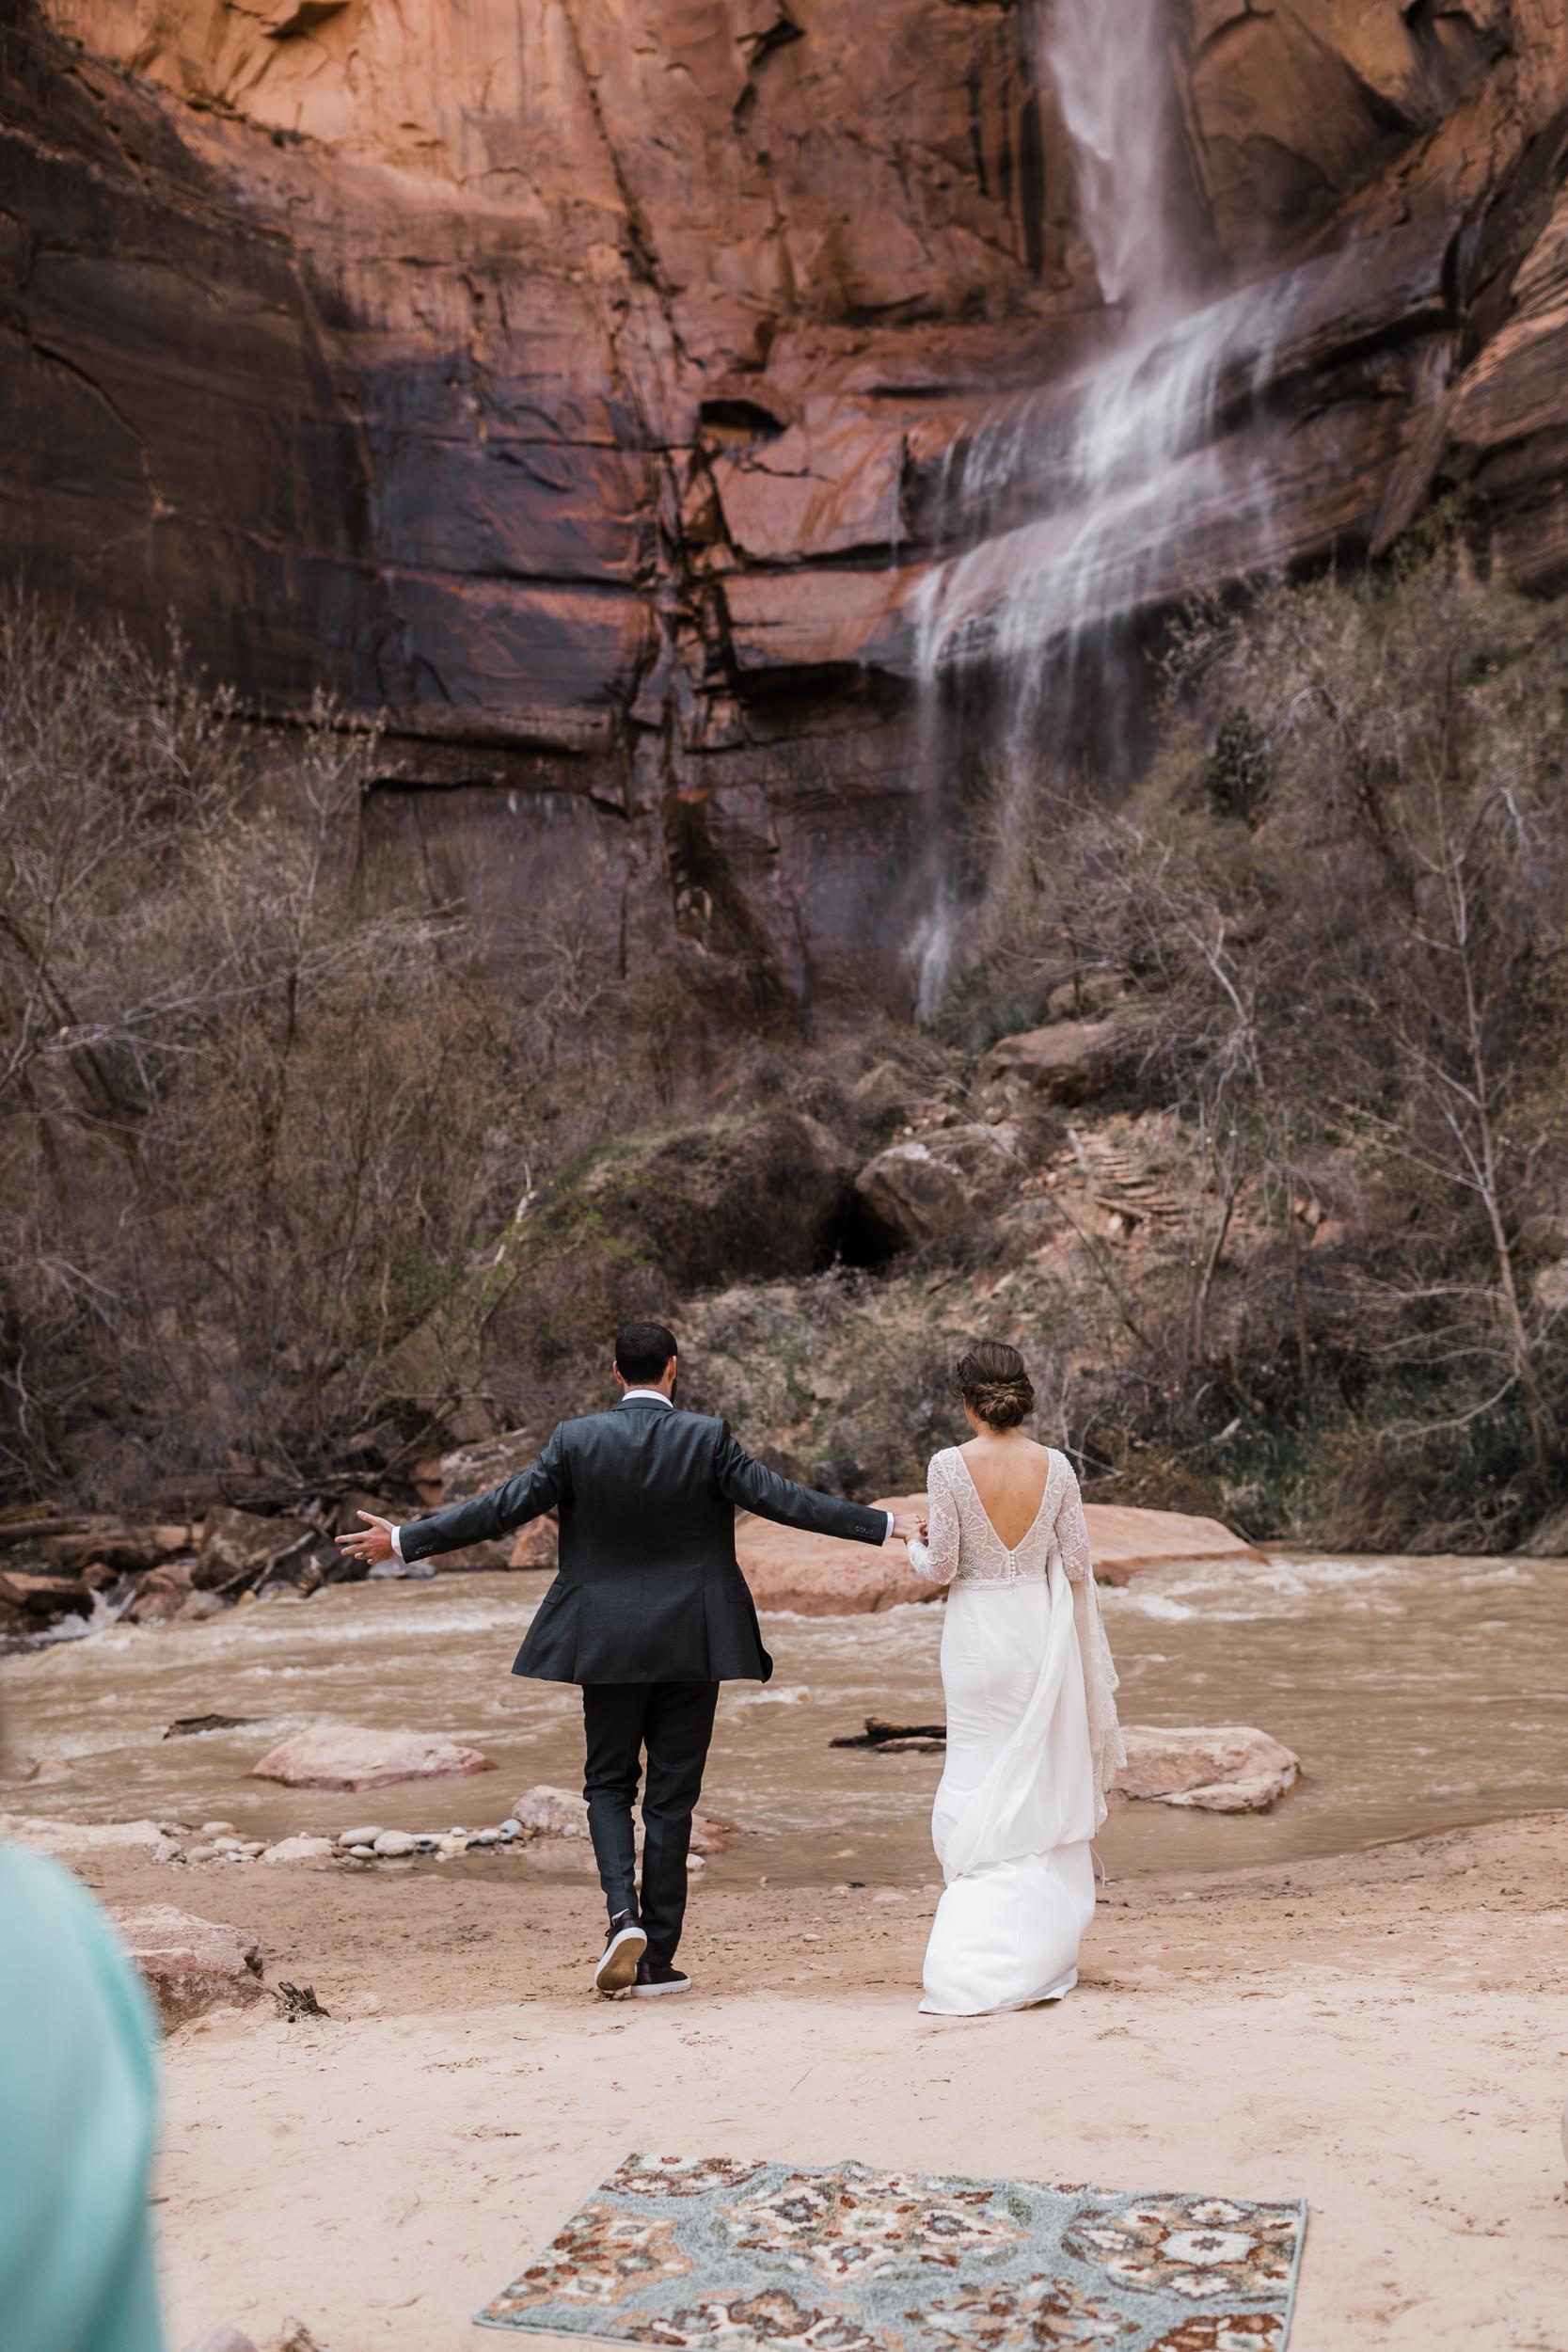 Zion-National-Park-Adventure-Wedding-Hearnes-Elopement-Photography-28.jpg